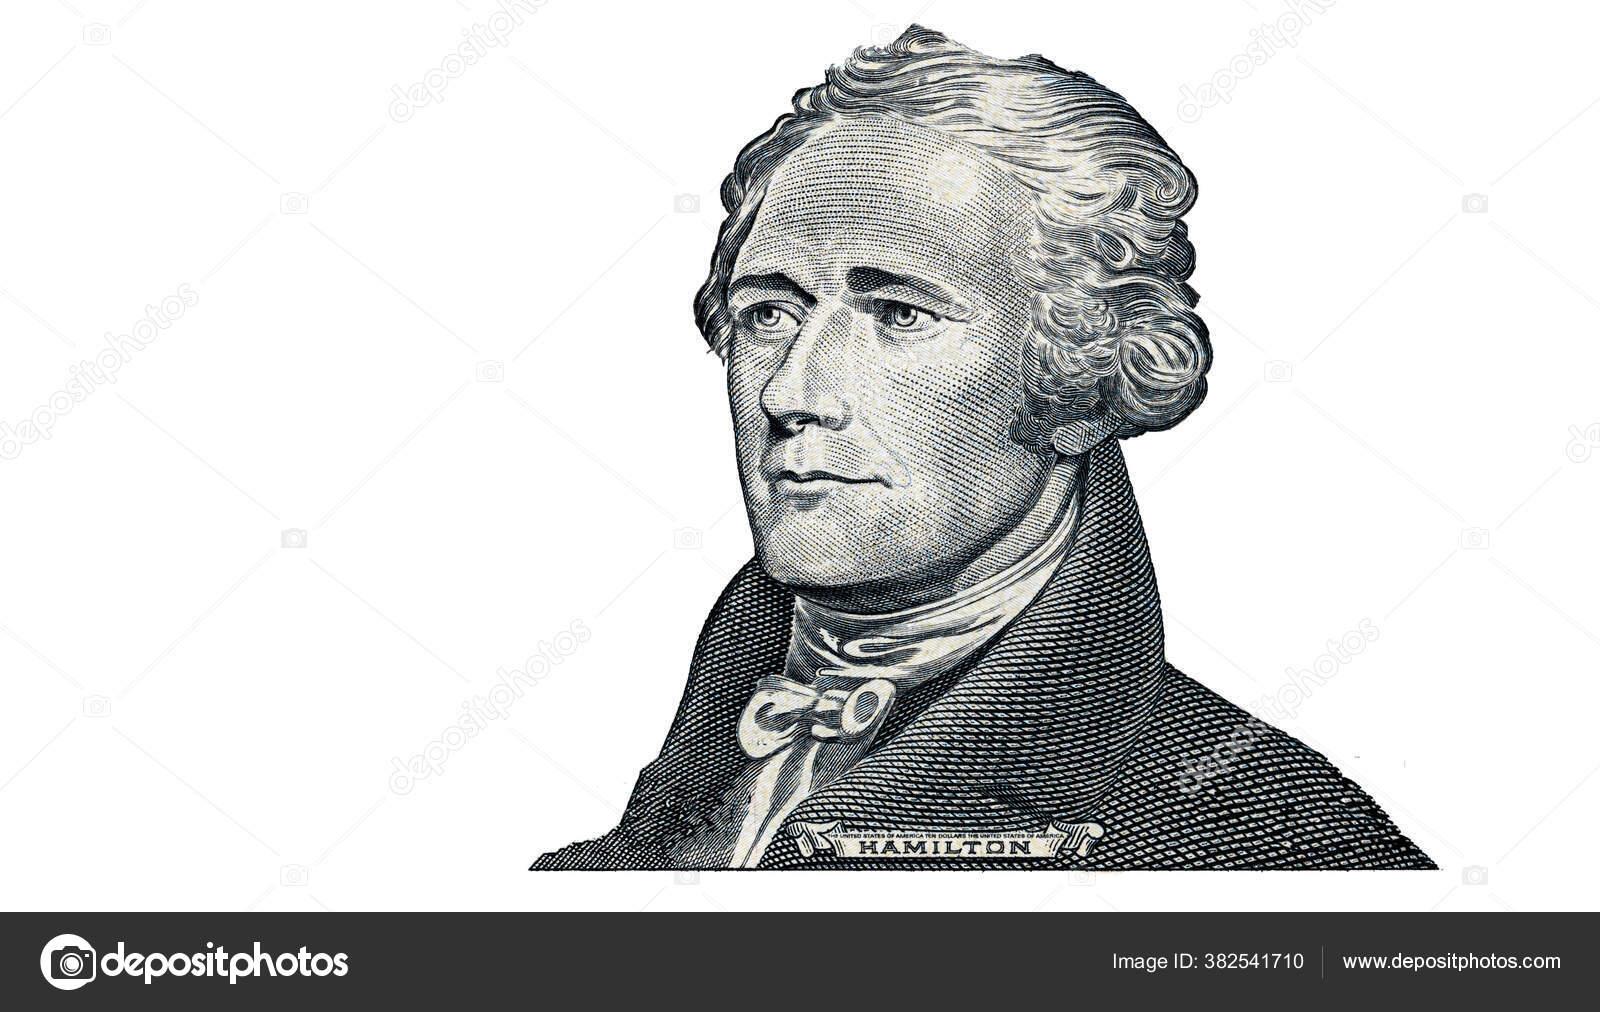 Hamilton alexander